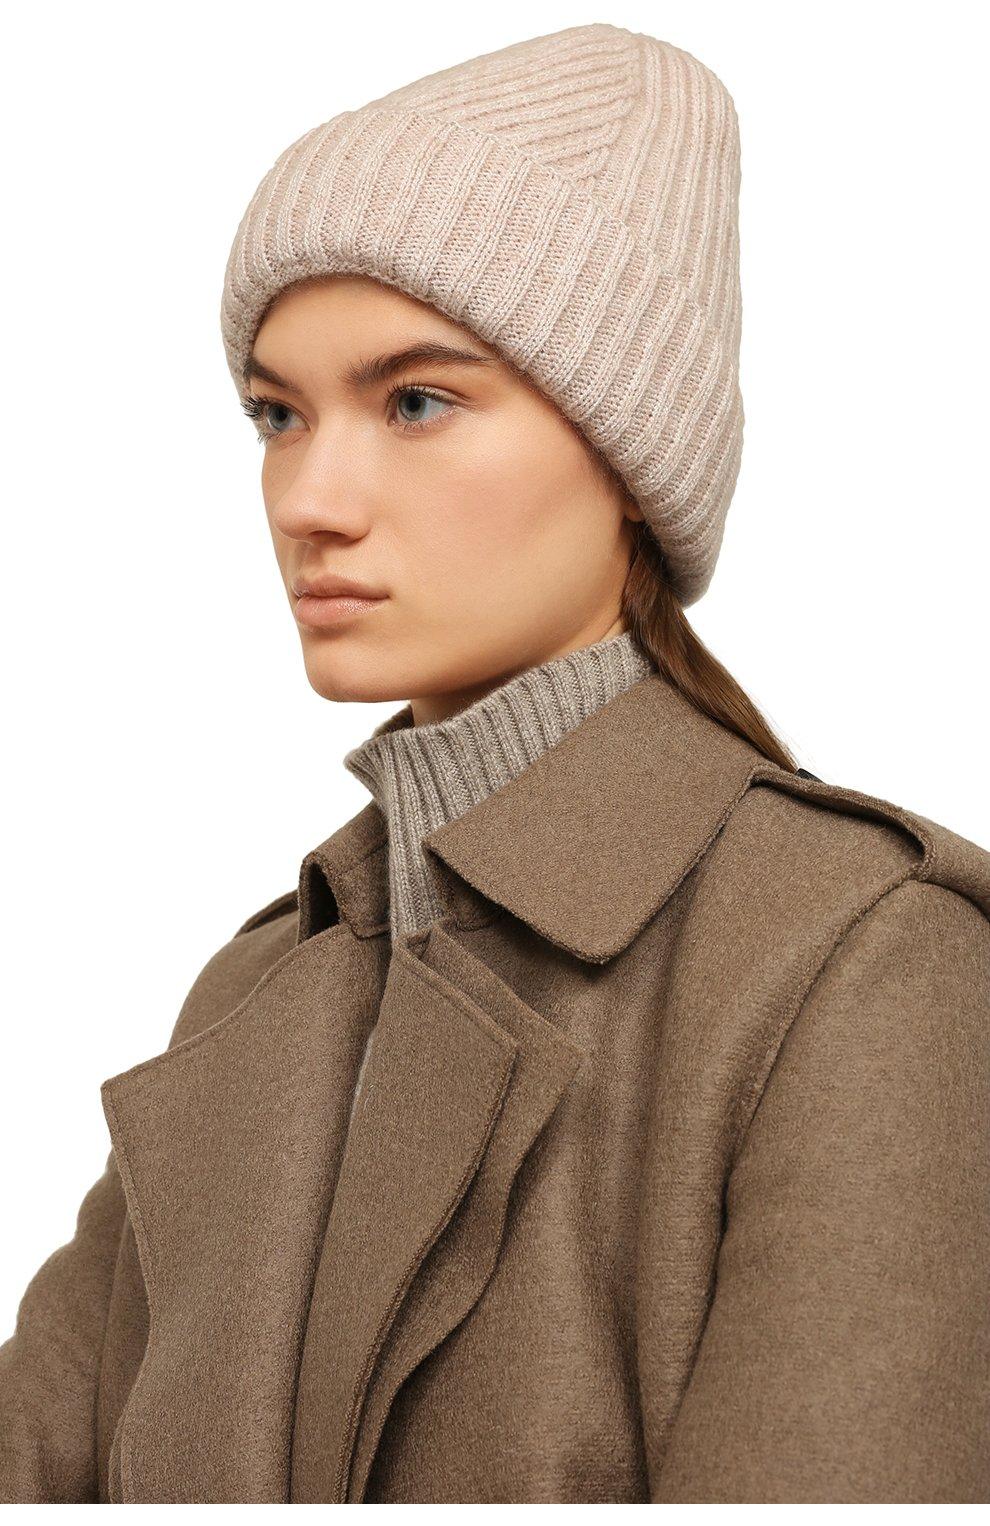 Женская шапка monica CANOE бежевого цвета, арт. 4918269 | Фото 2